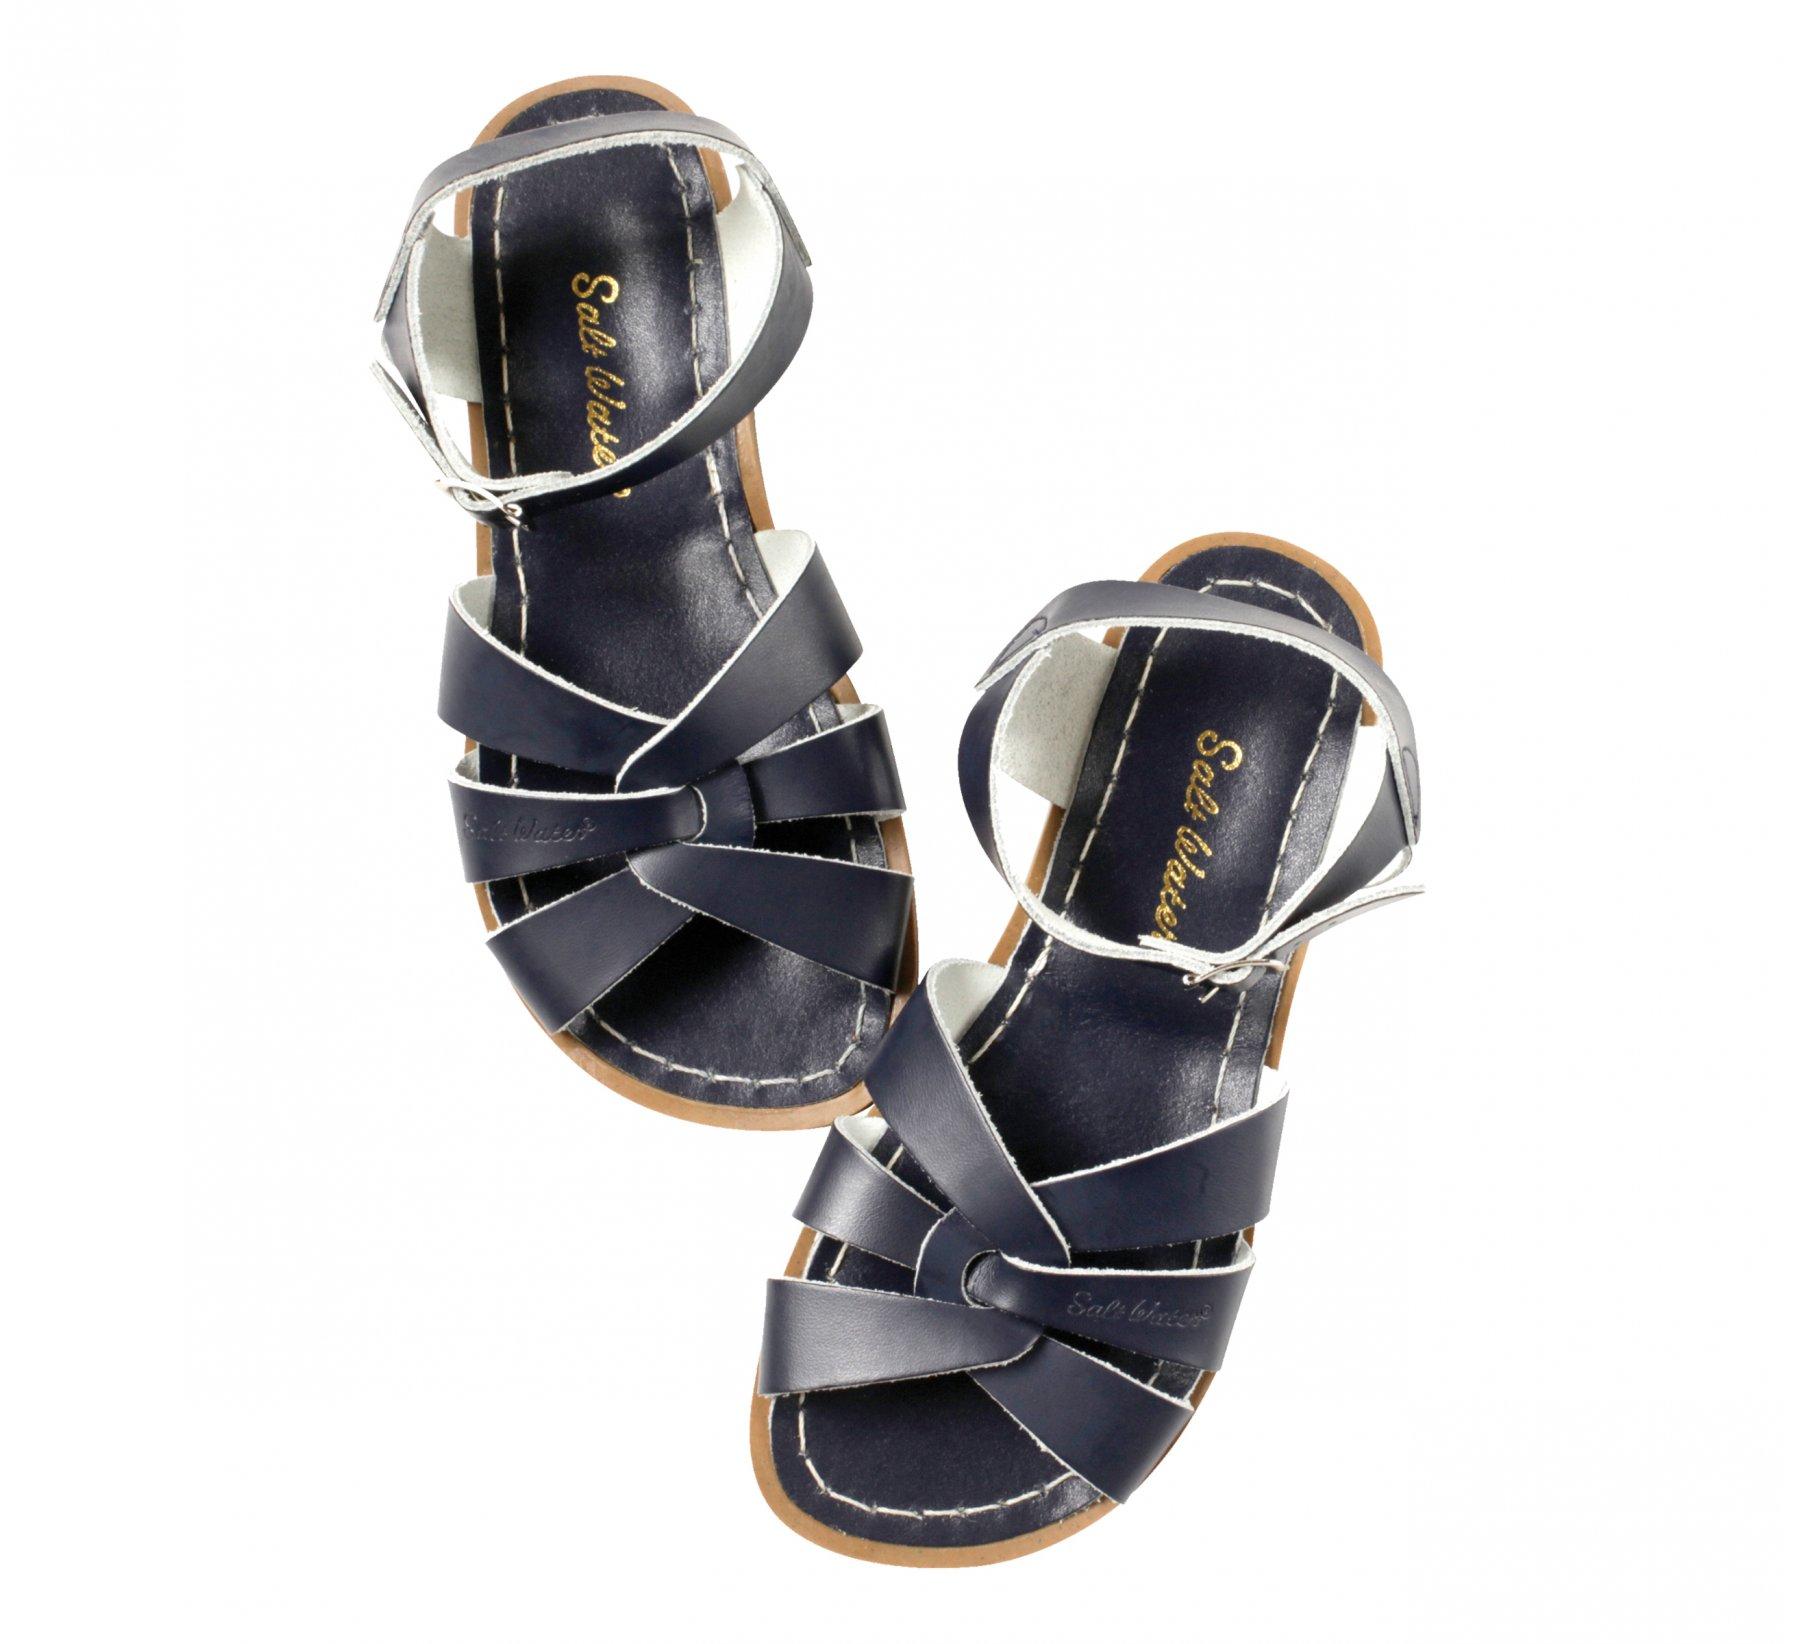 Original Navy - Salt Water Sandals